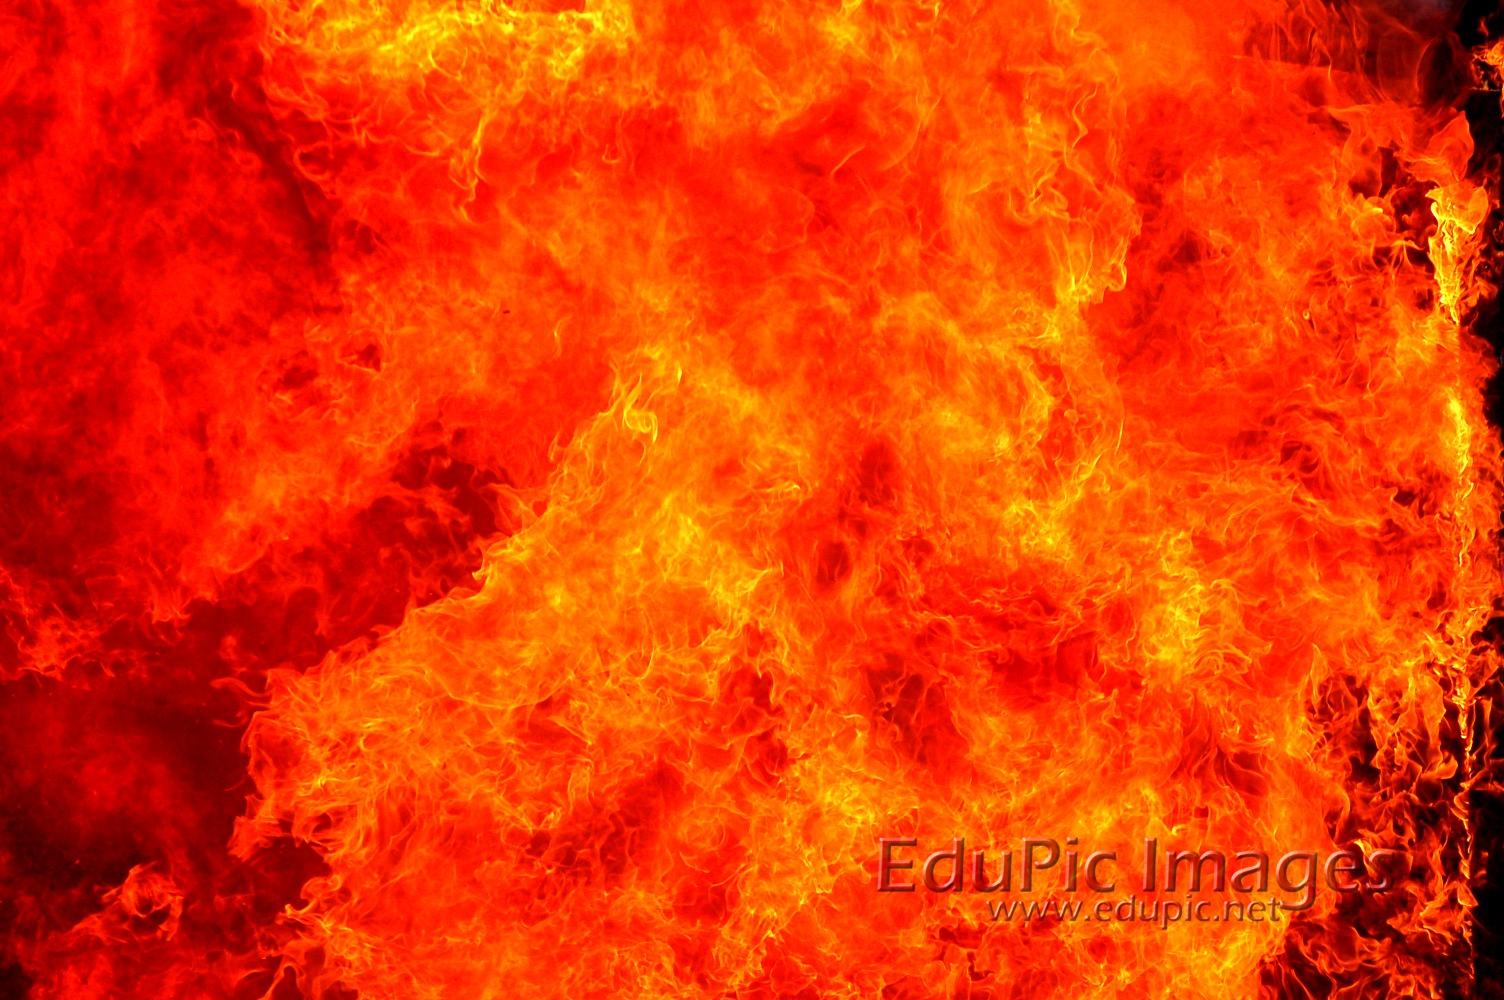 fire flames live burn 1504x1000